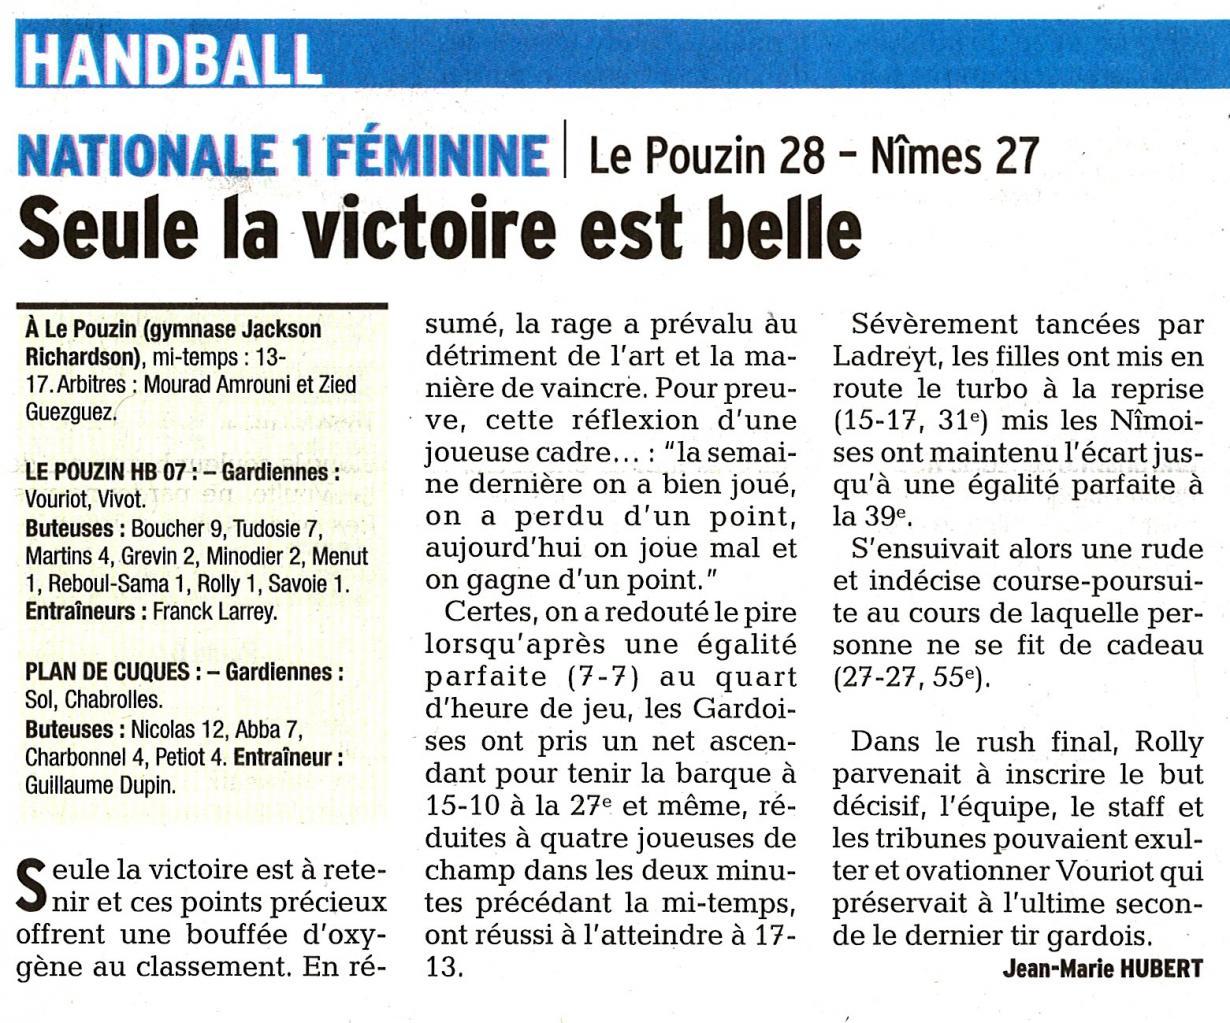 dl-sports-18-11-2013.jpg